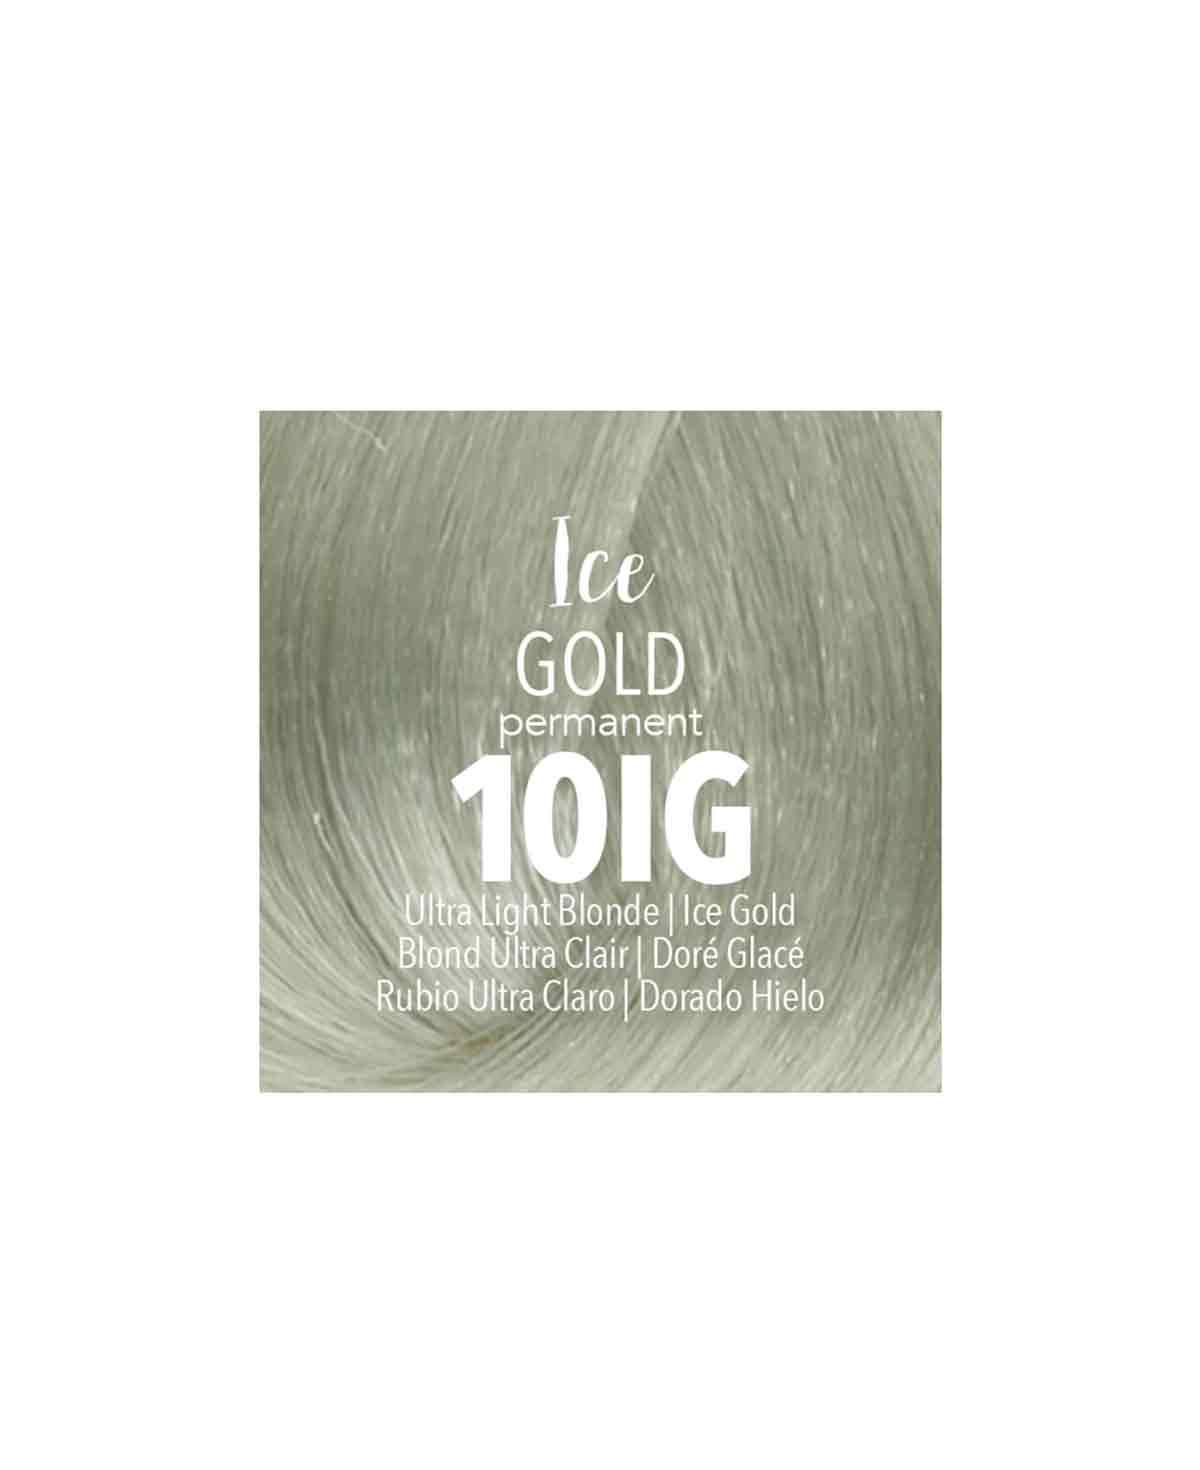 Mydentity  - 10IG Ultra Light Blonde Ice Gold